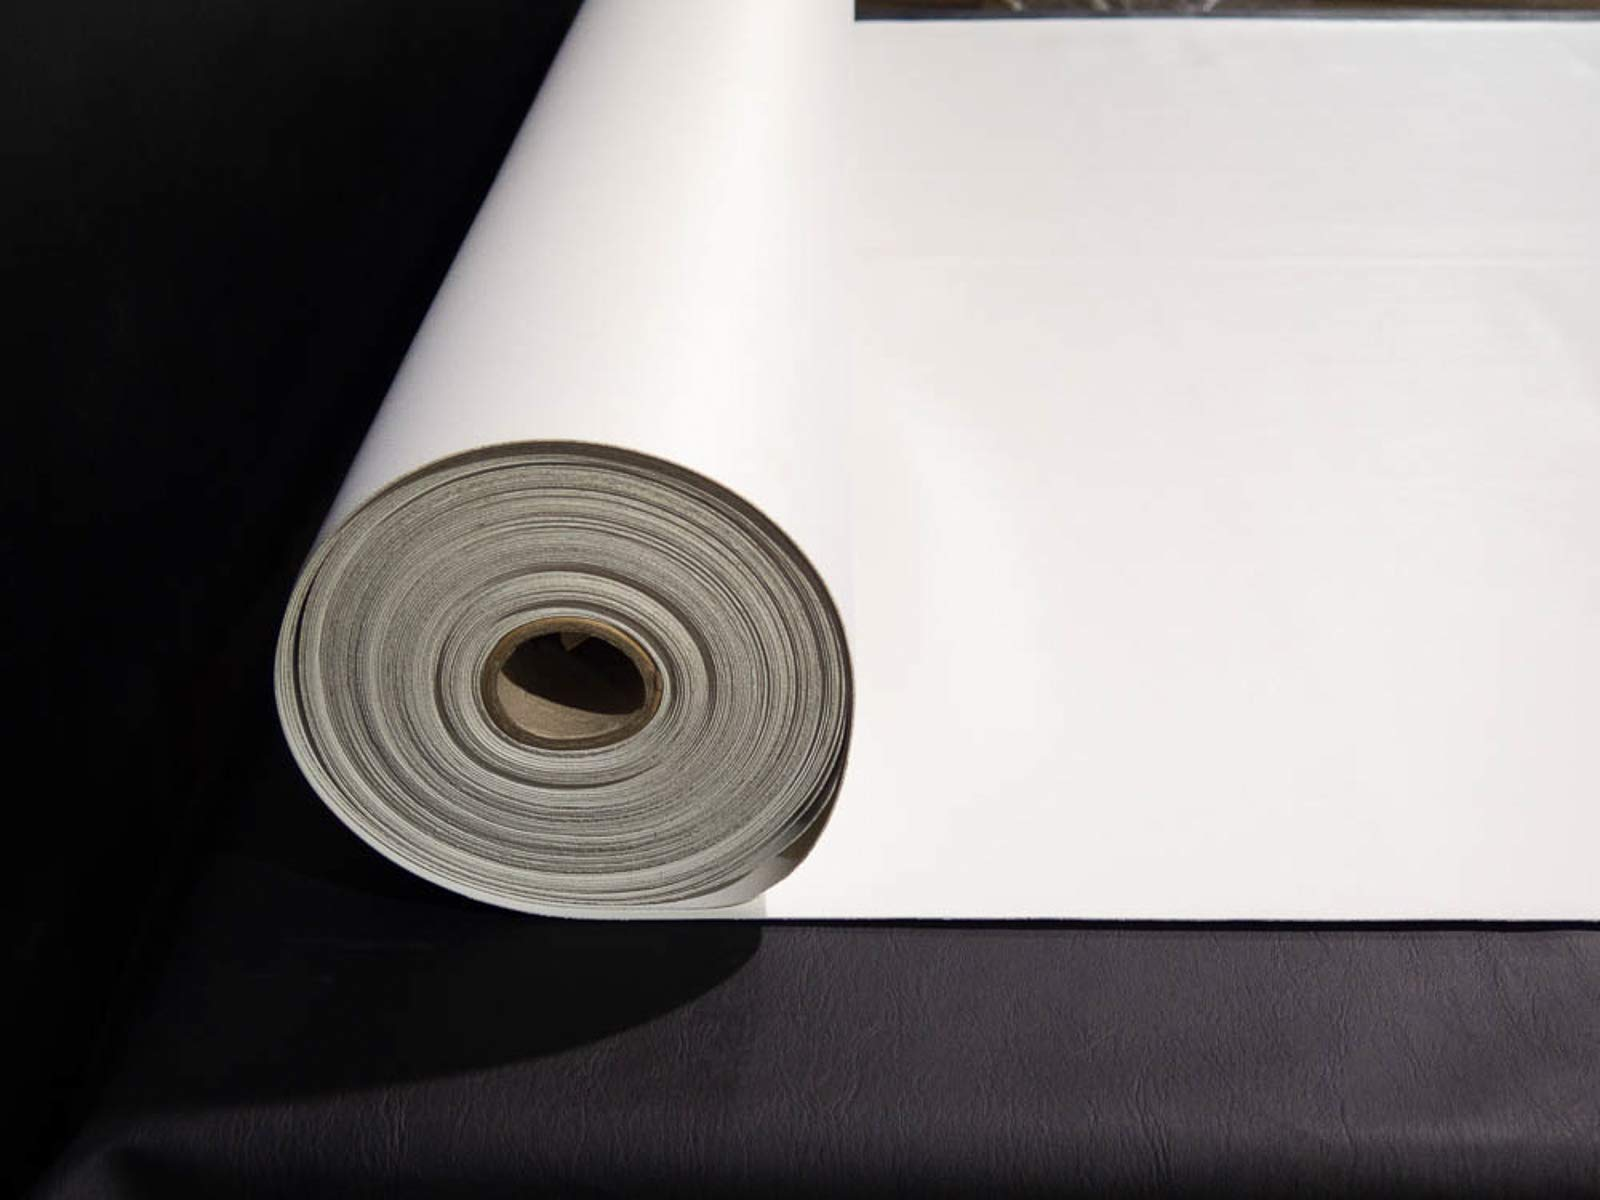 Bry-Tech Marine1 Marine Vinyl Upholstery Fabric Bright White 54'' Wide by 10 Yards Boat Auto by Bry-Tech Marine1 (Image #4)